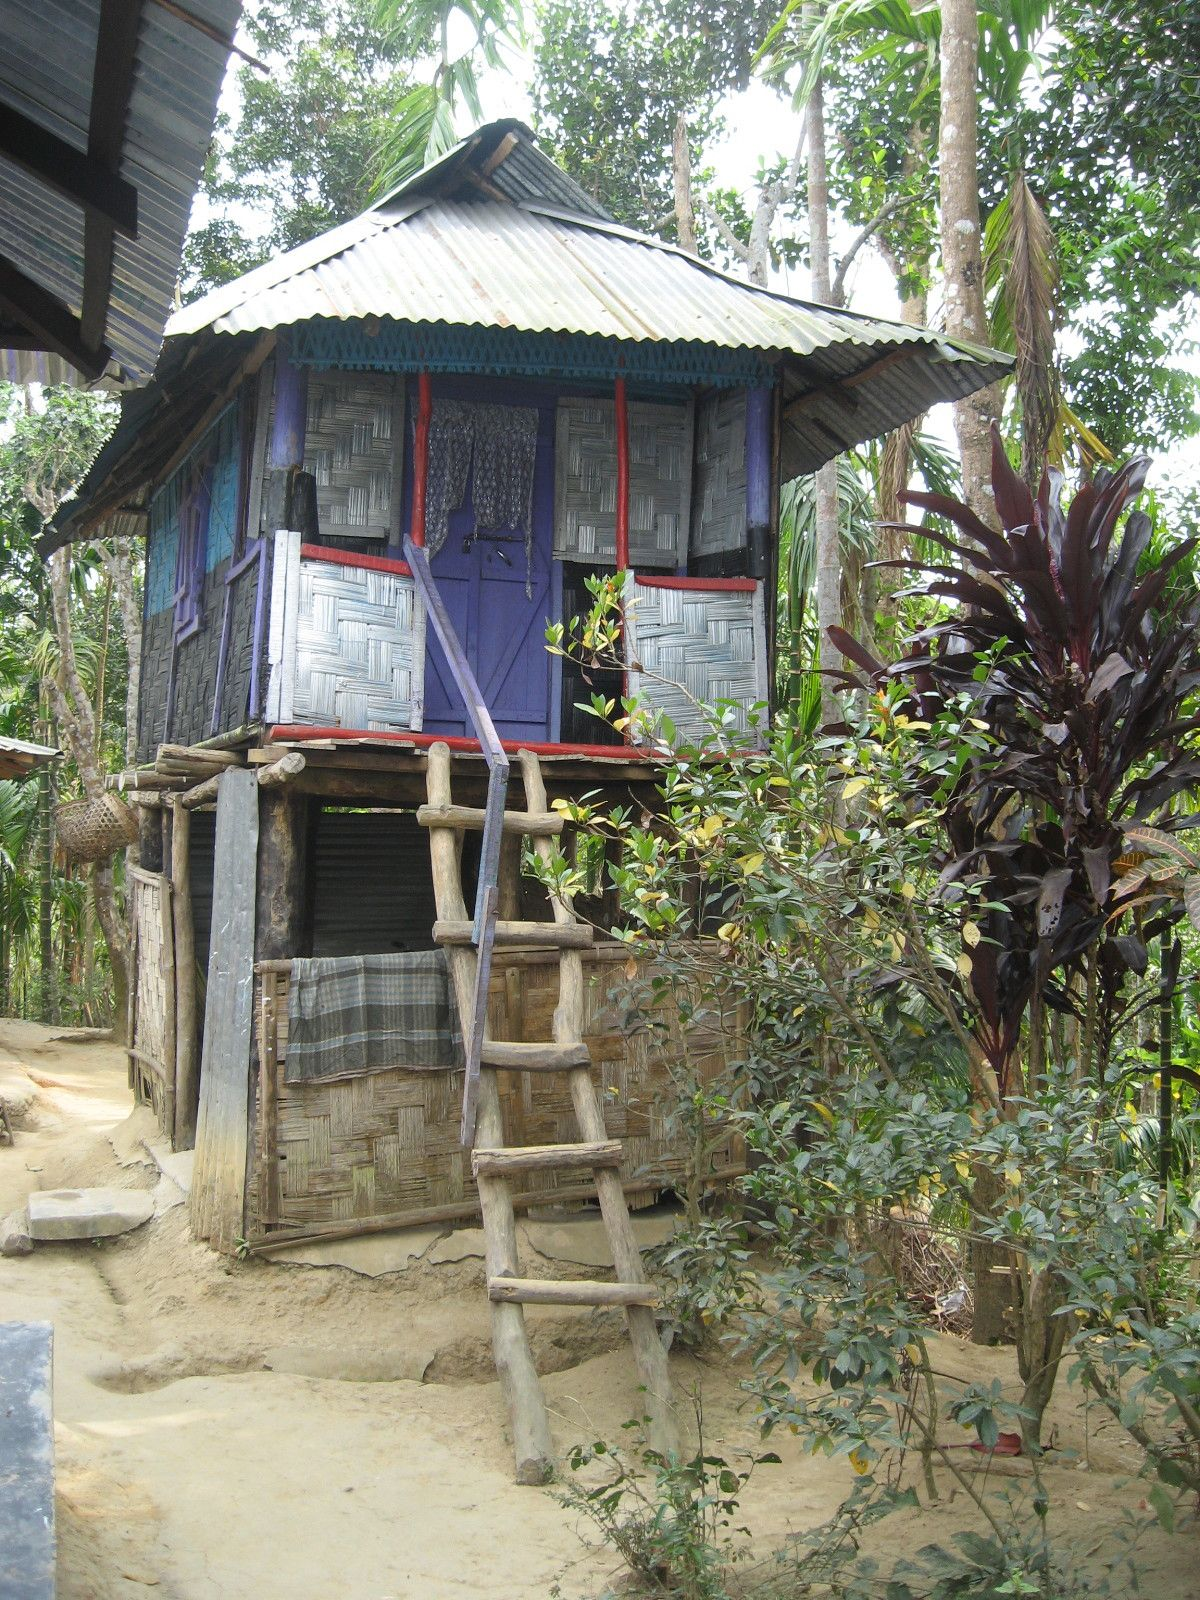 Tiny houses on stilts - Lawachara Indigenous Villages House On Stiltstiny